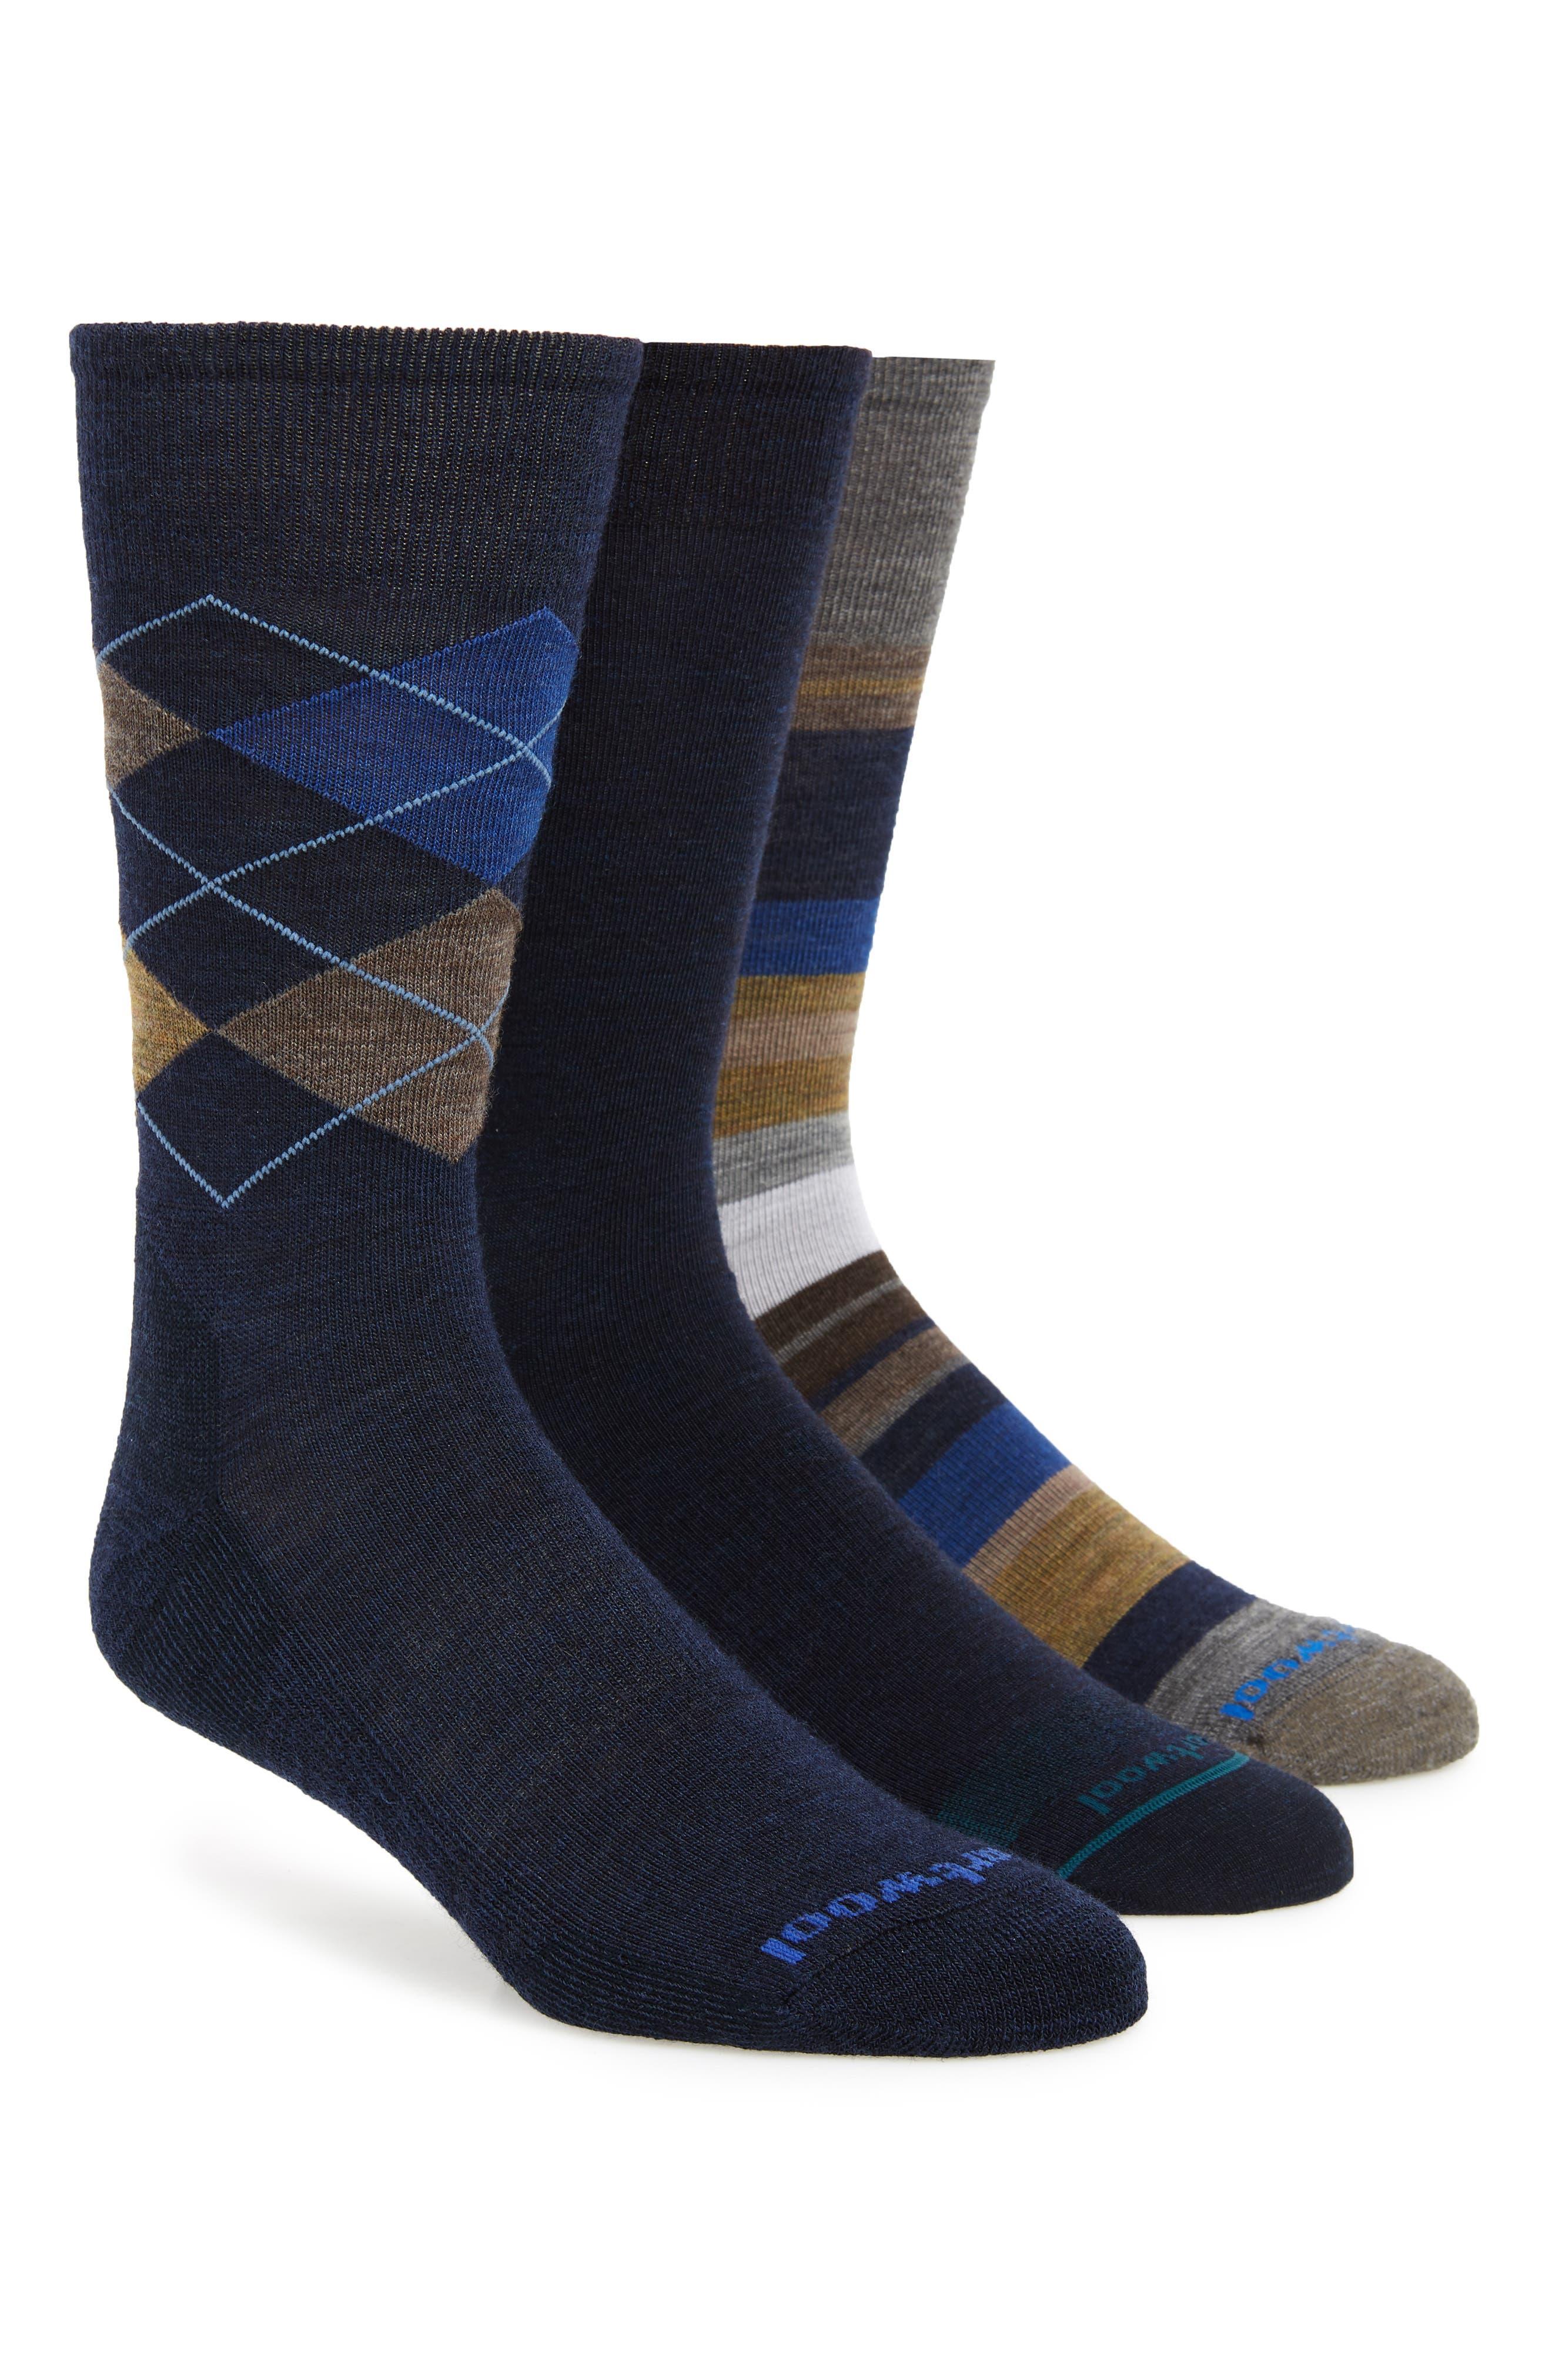 3-Pack Socks,                             Main thumbnail 1, color,                             400